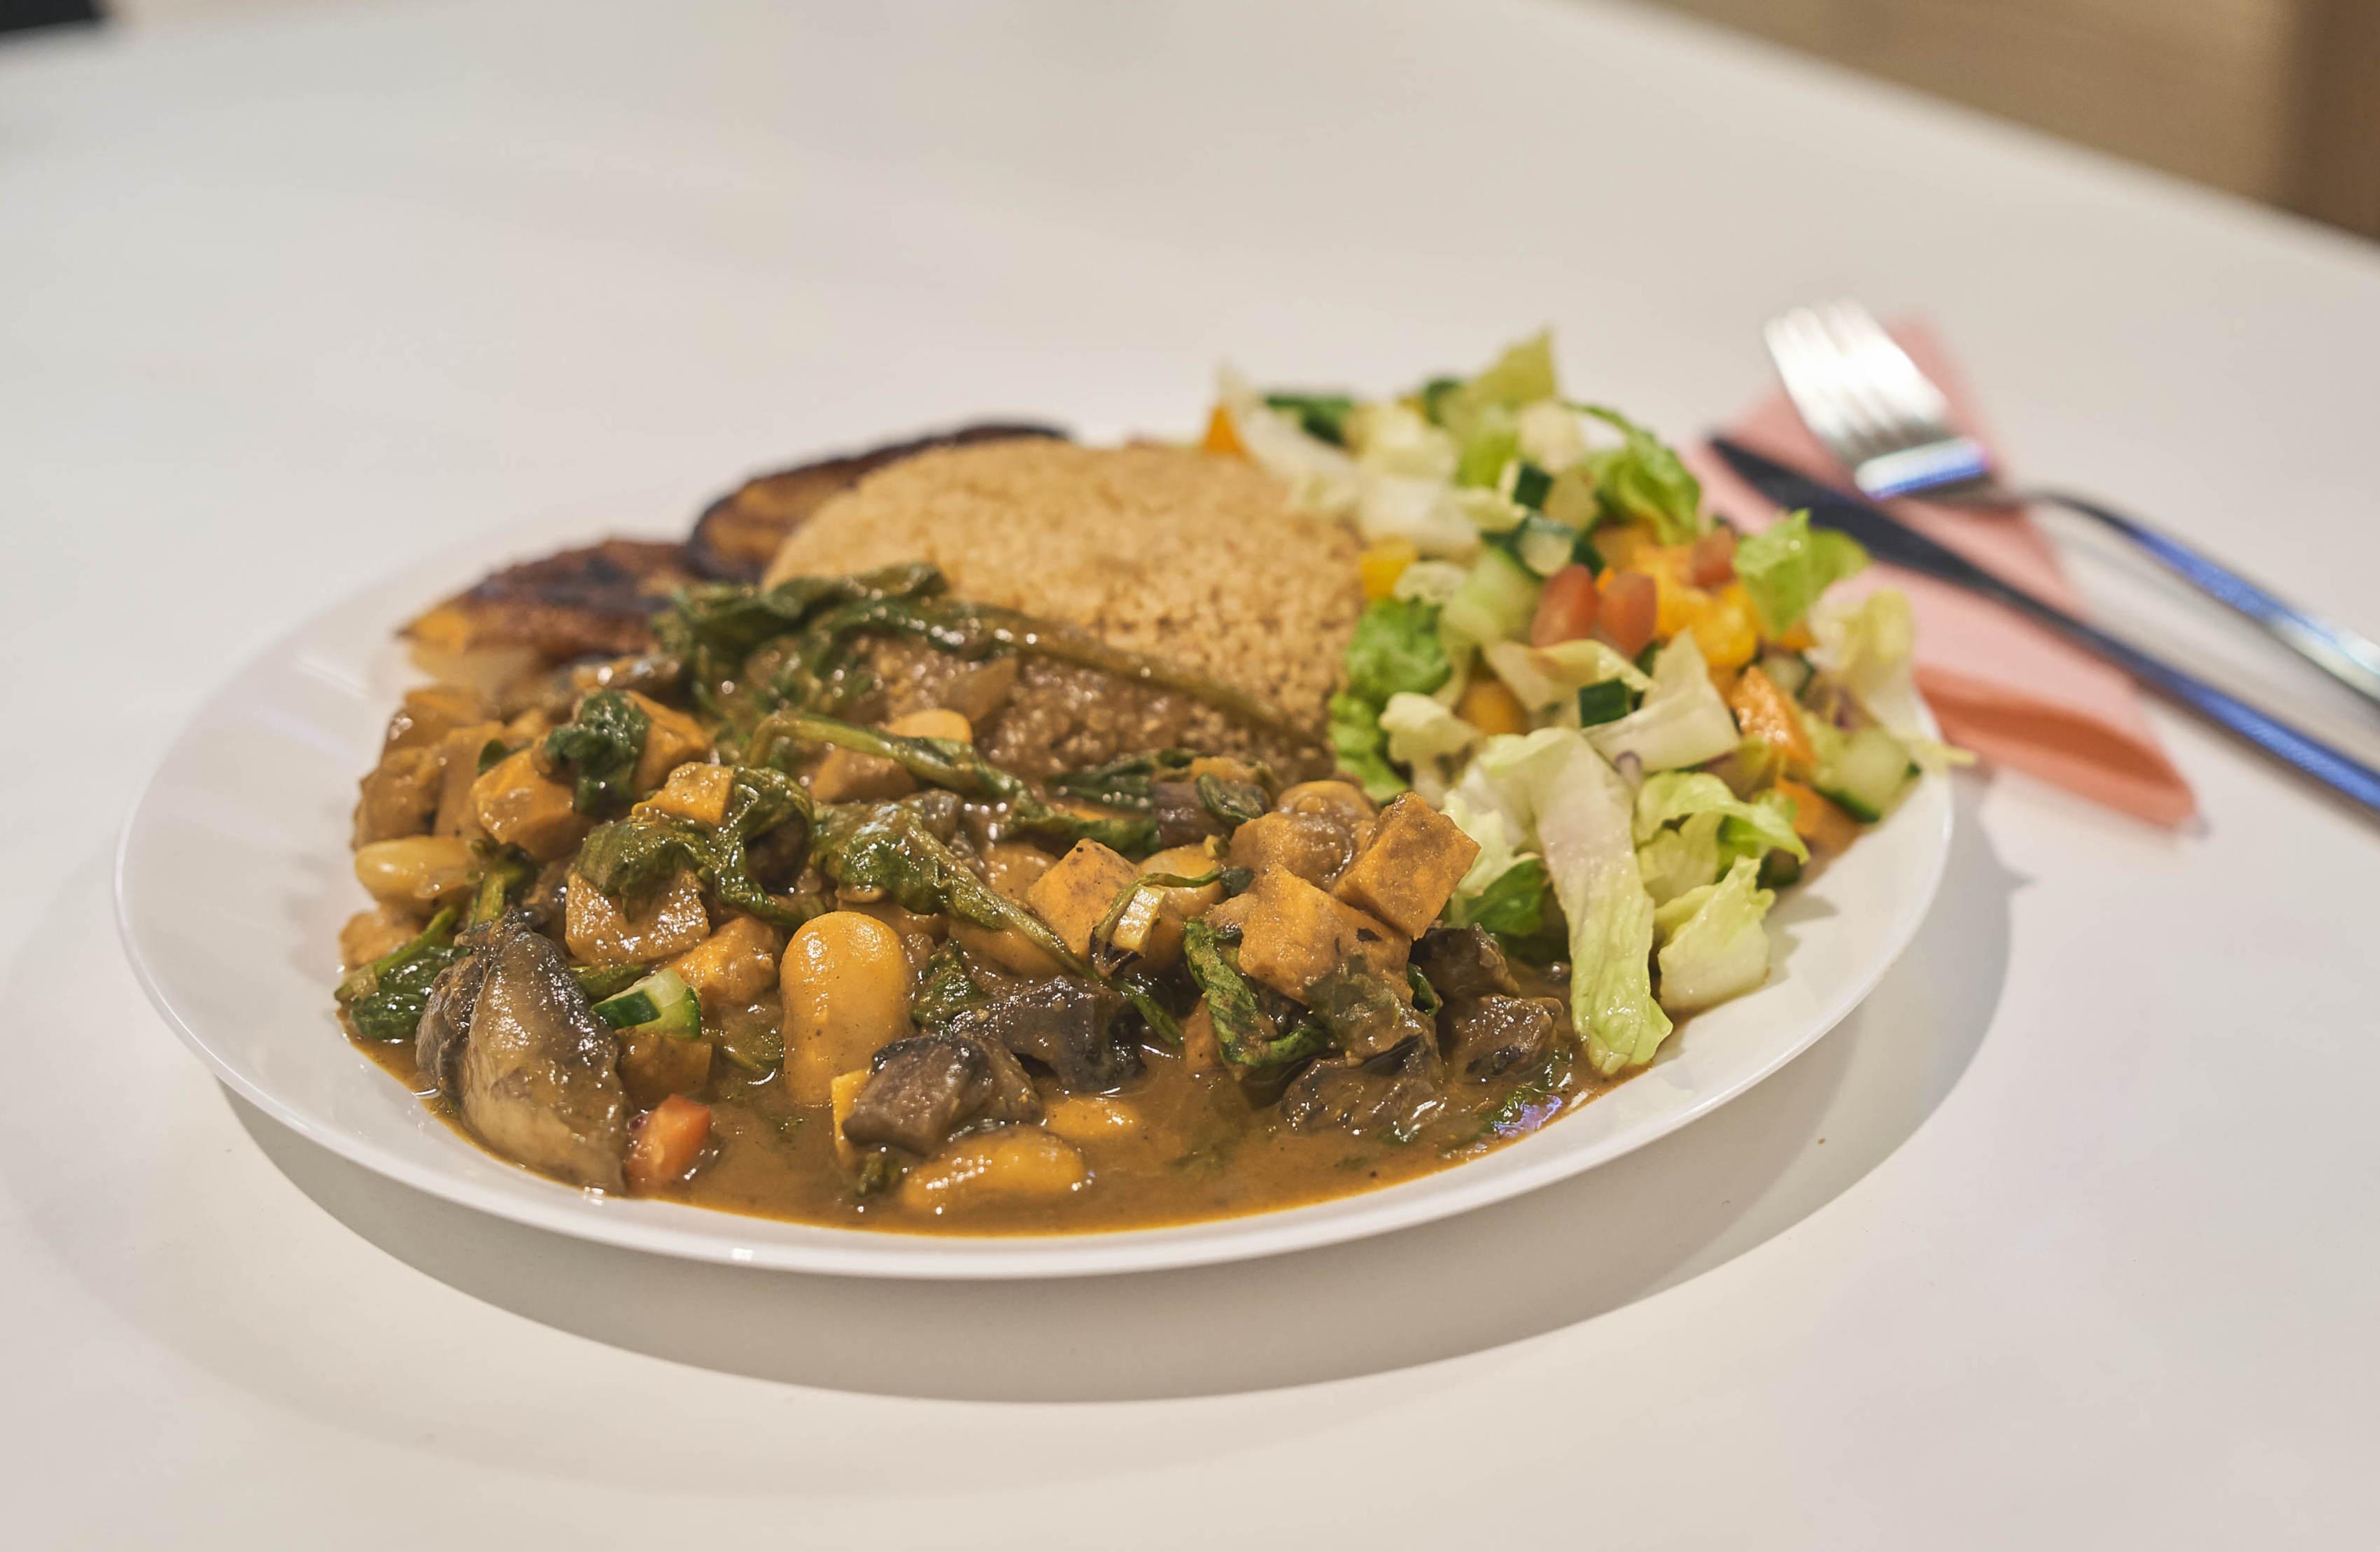 Best Afro-Vegan Restaurants in London: Deserted Cactus in Peckham